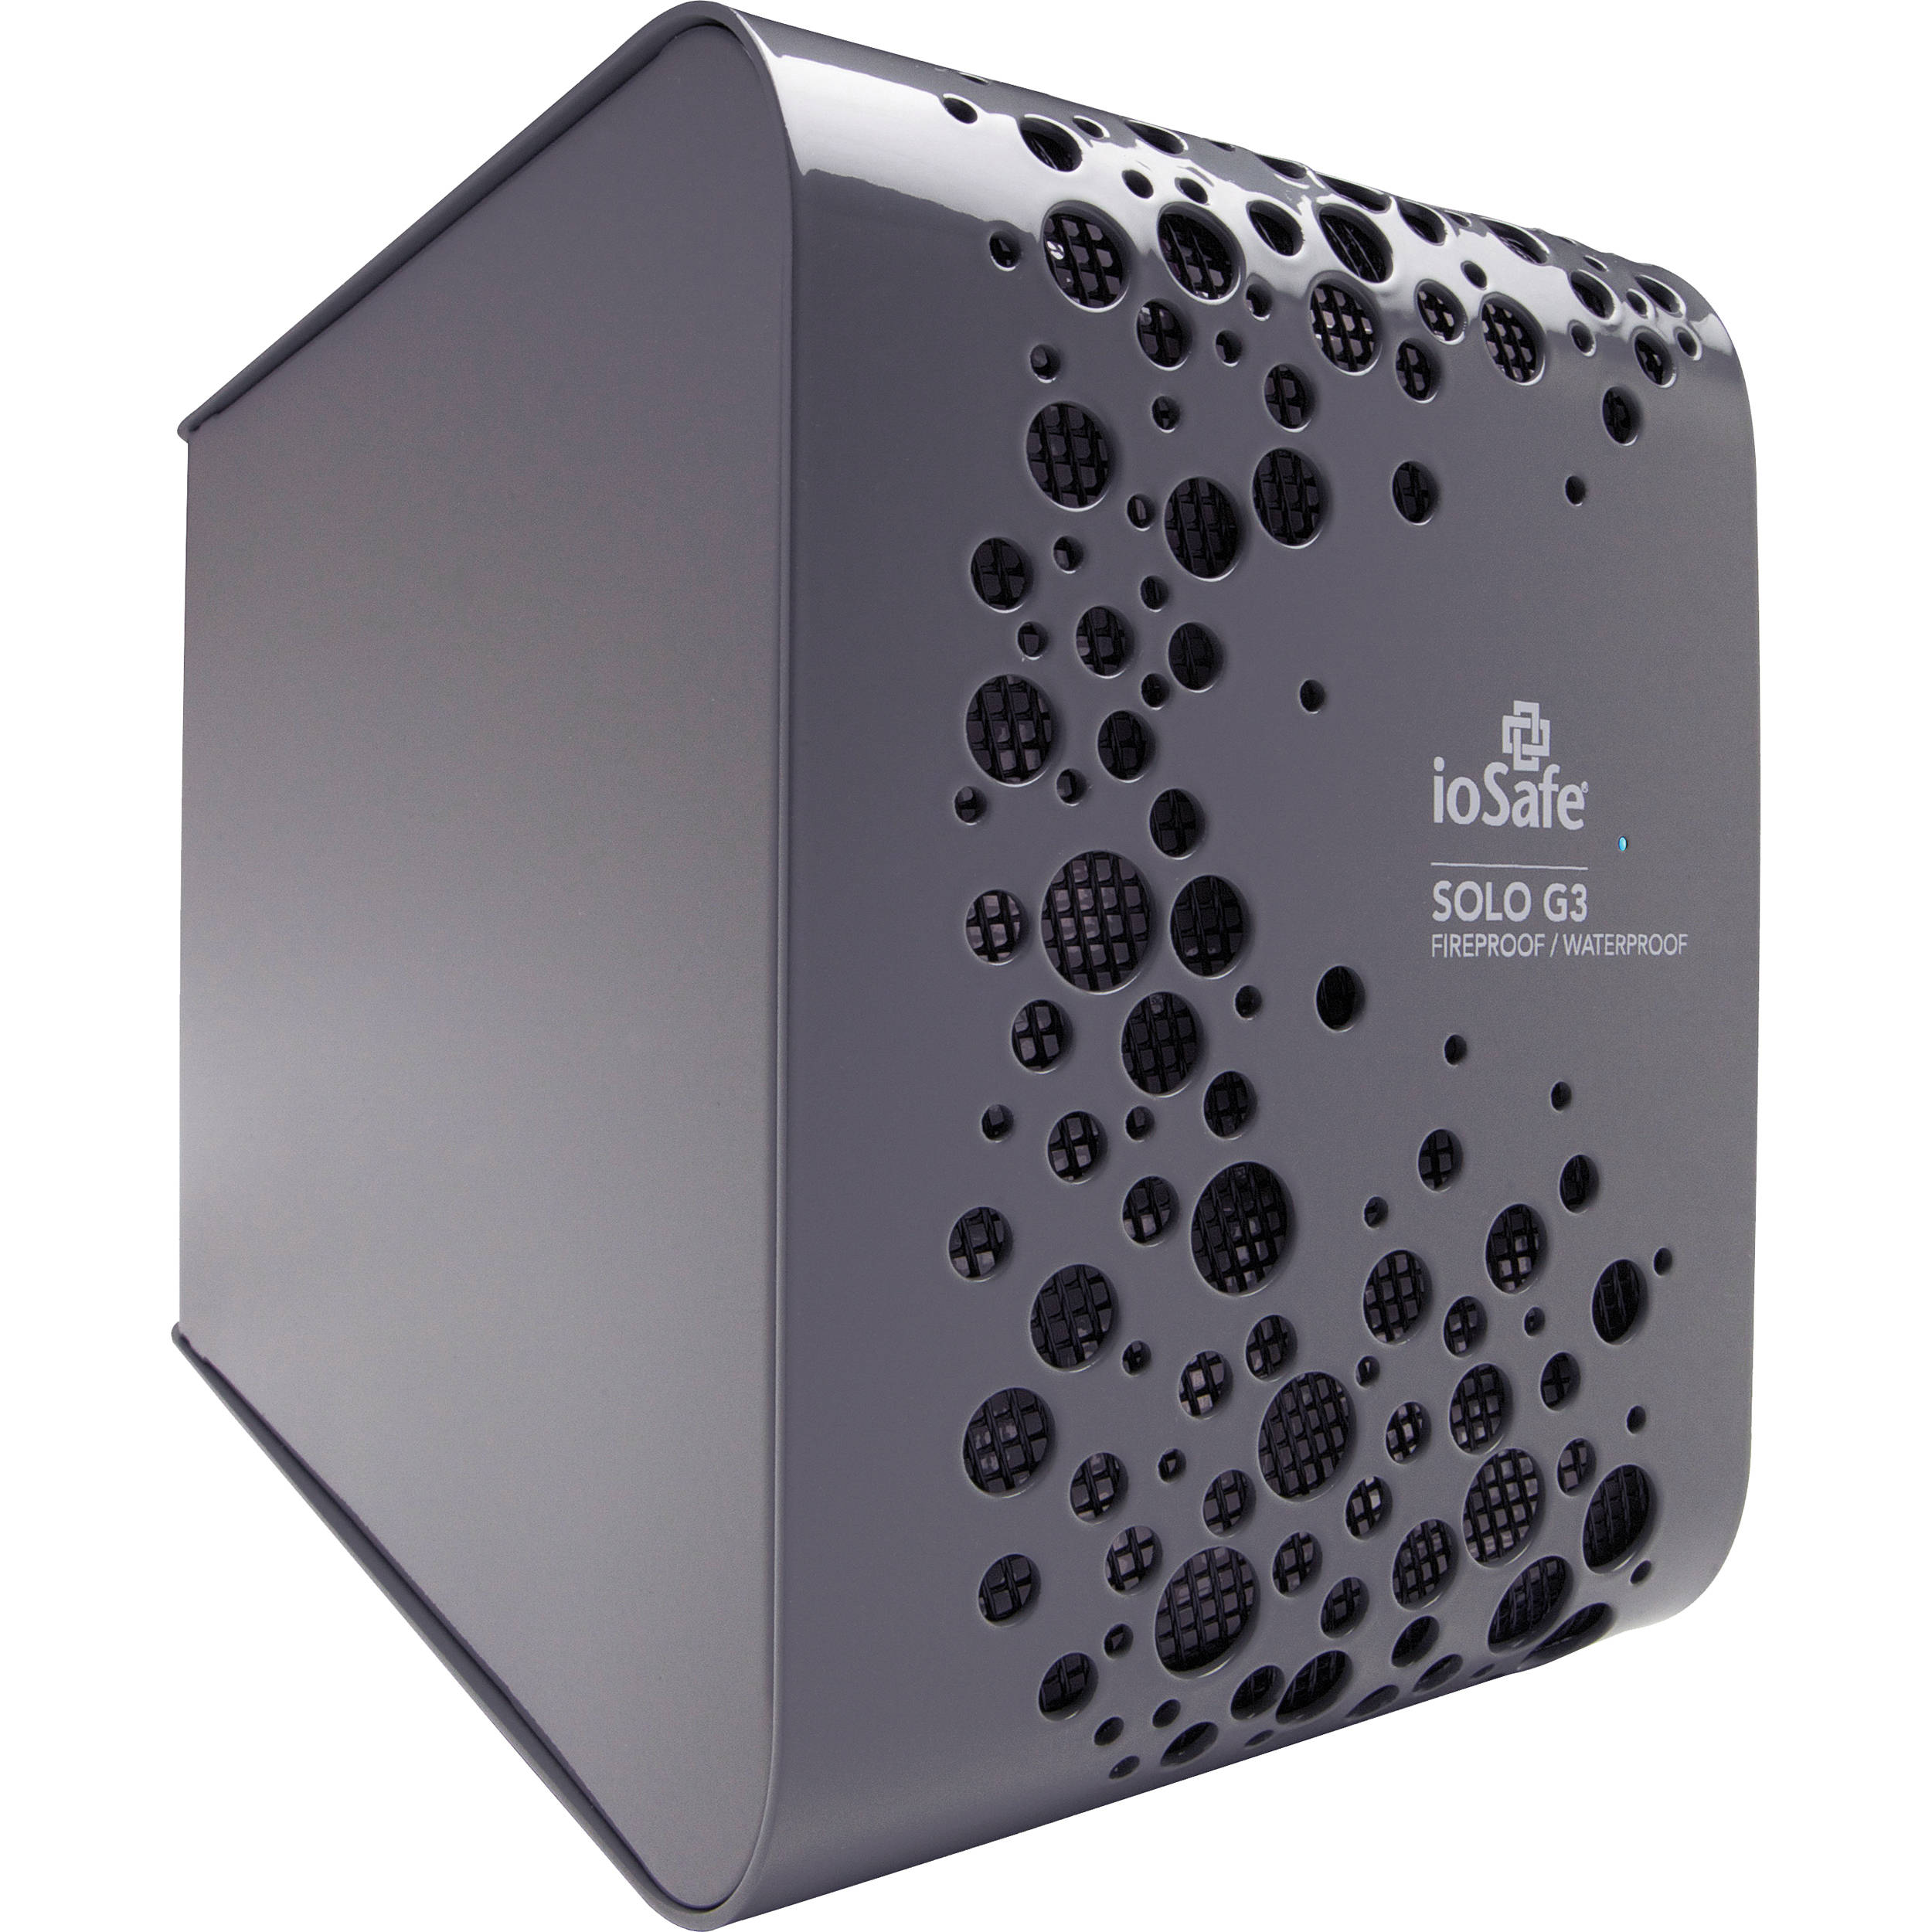 Iosafe 3tb solo g3 usb 3 0 external hard drive sk3tb b h photo for 3tb esterno